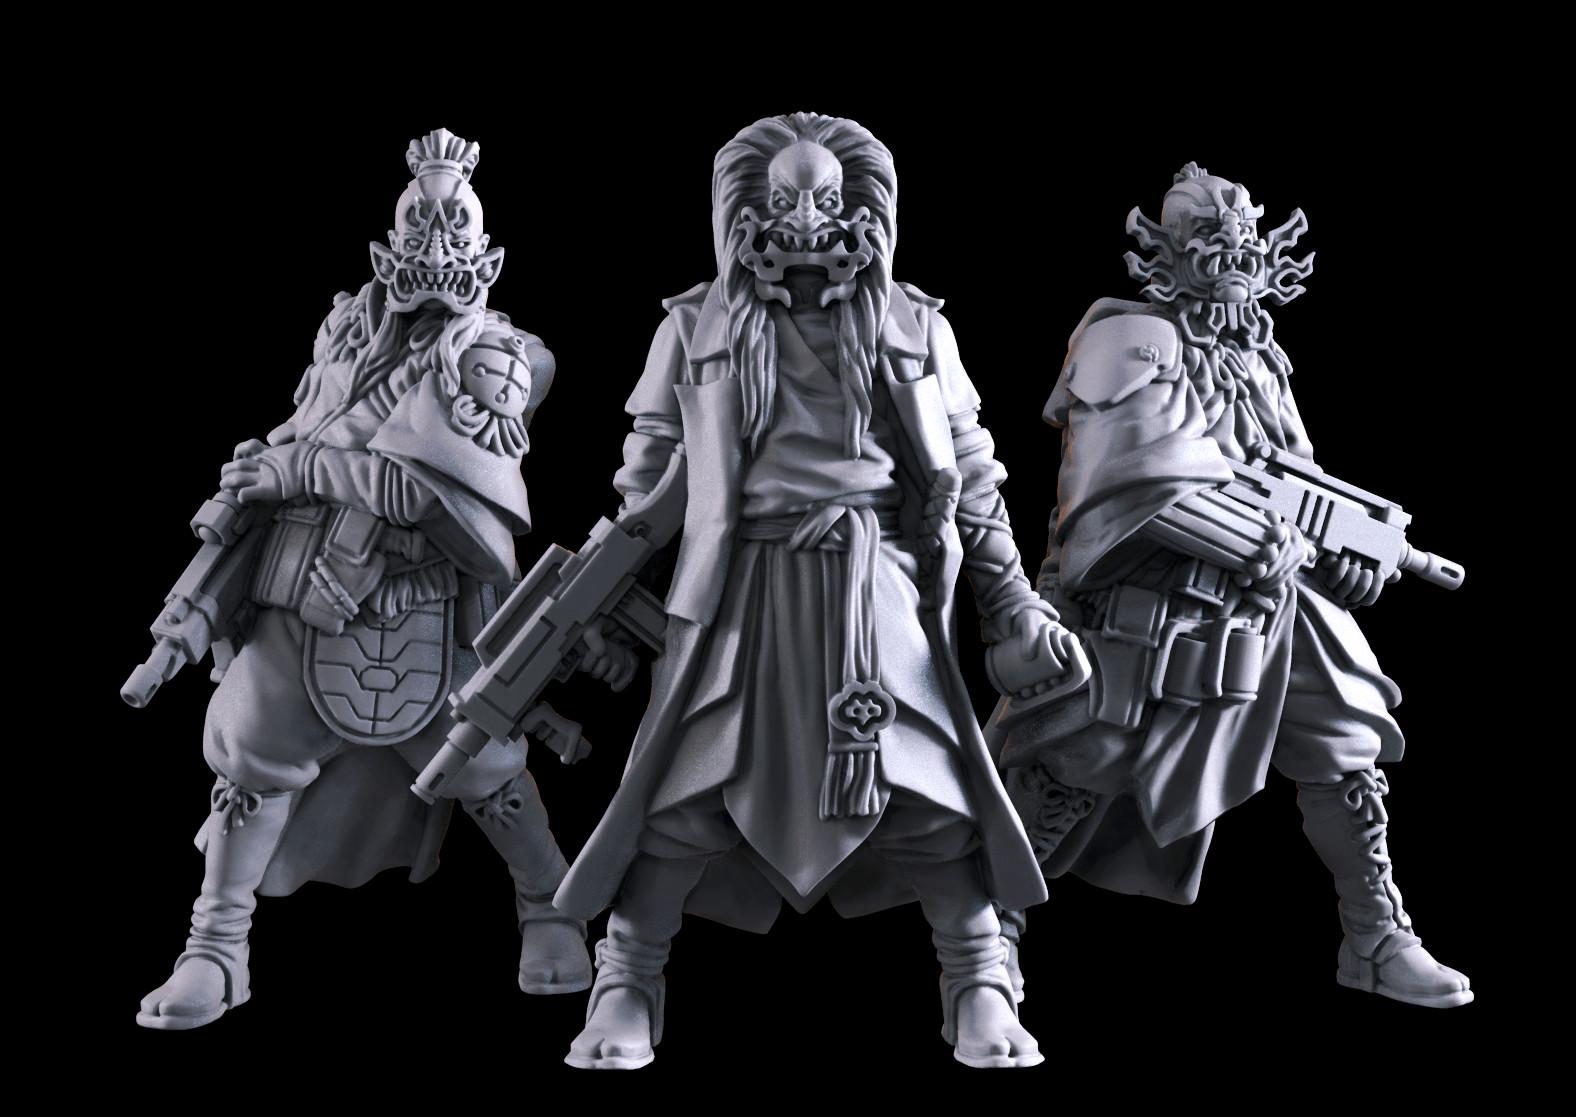 Michael jenkins kabuki gang together